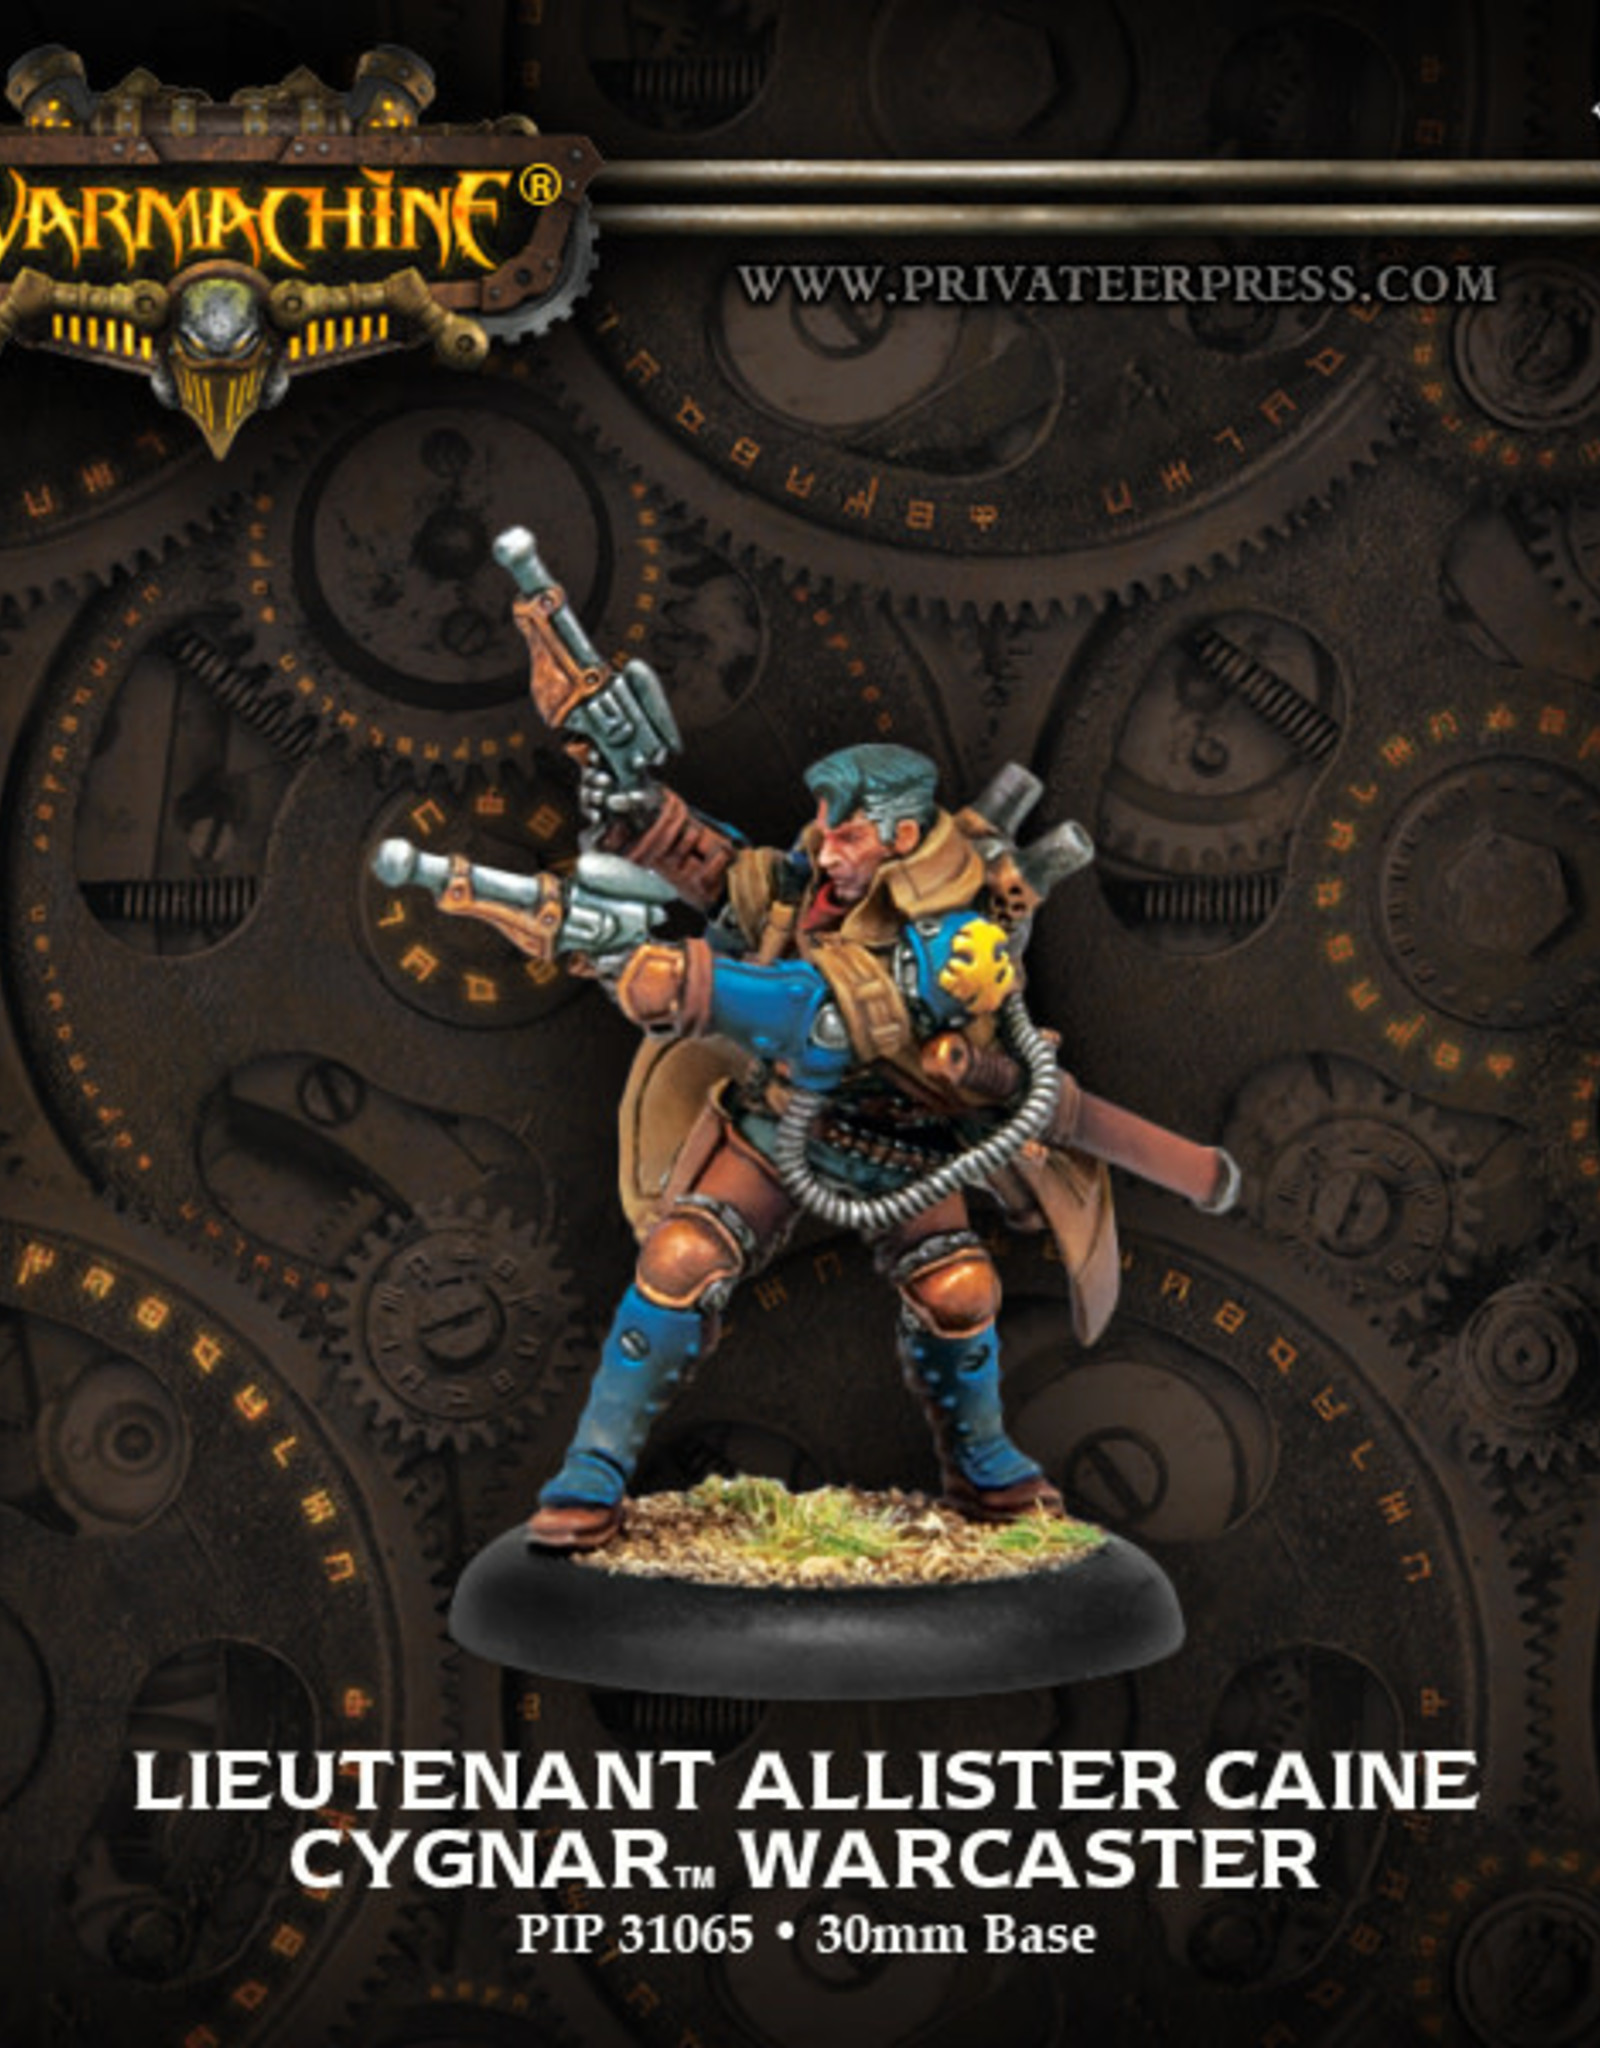 Warmachine Cygnar - Lt. Allister Caine